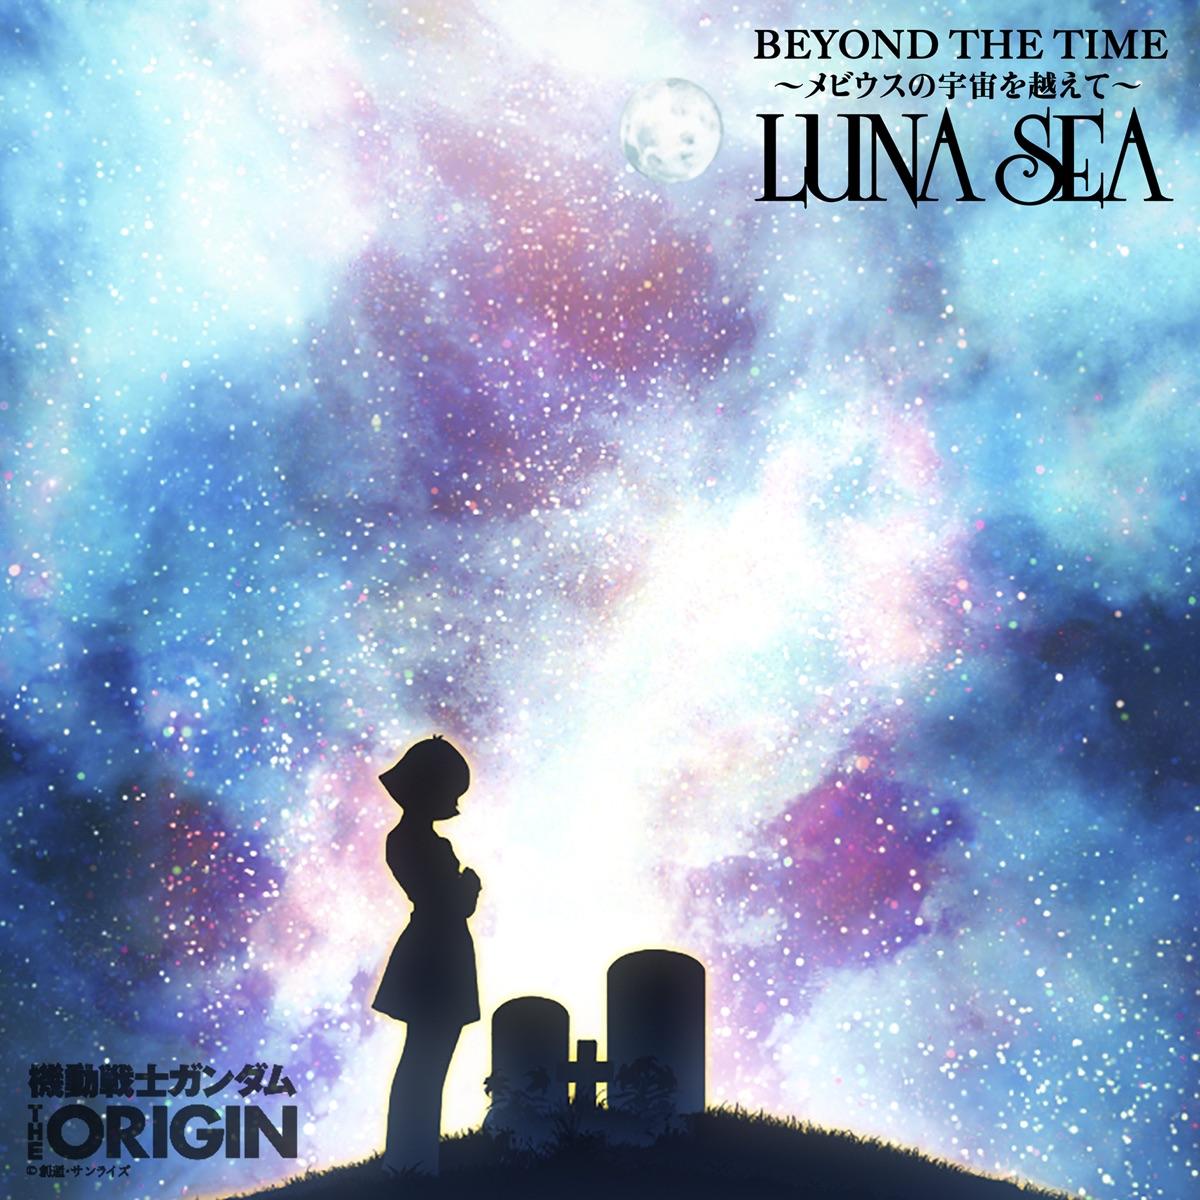 『LUNA SEABEYOND THE TIME ~メビウスの宇宙を越えて~』収録の『BEYOND THE TIME〜メビウスの宇宙を越えて〜』ジャケット